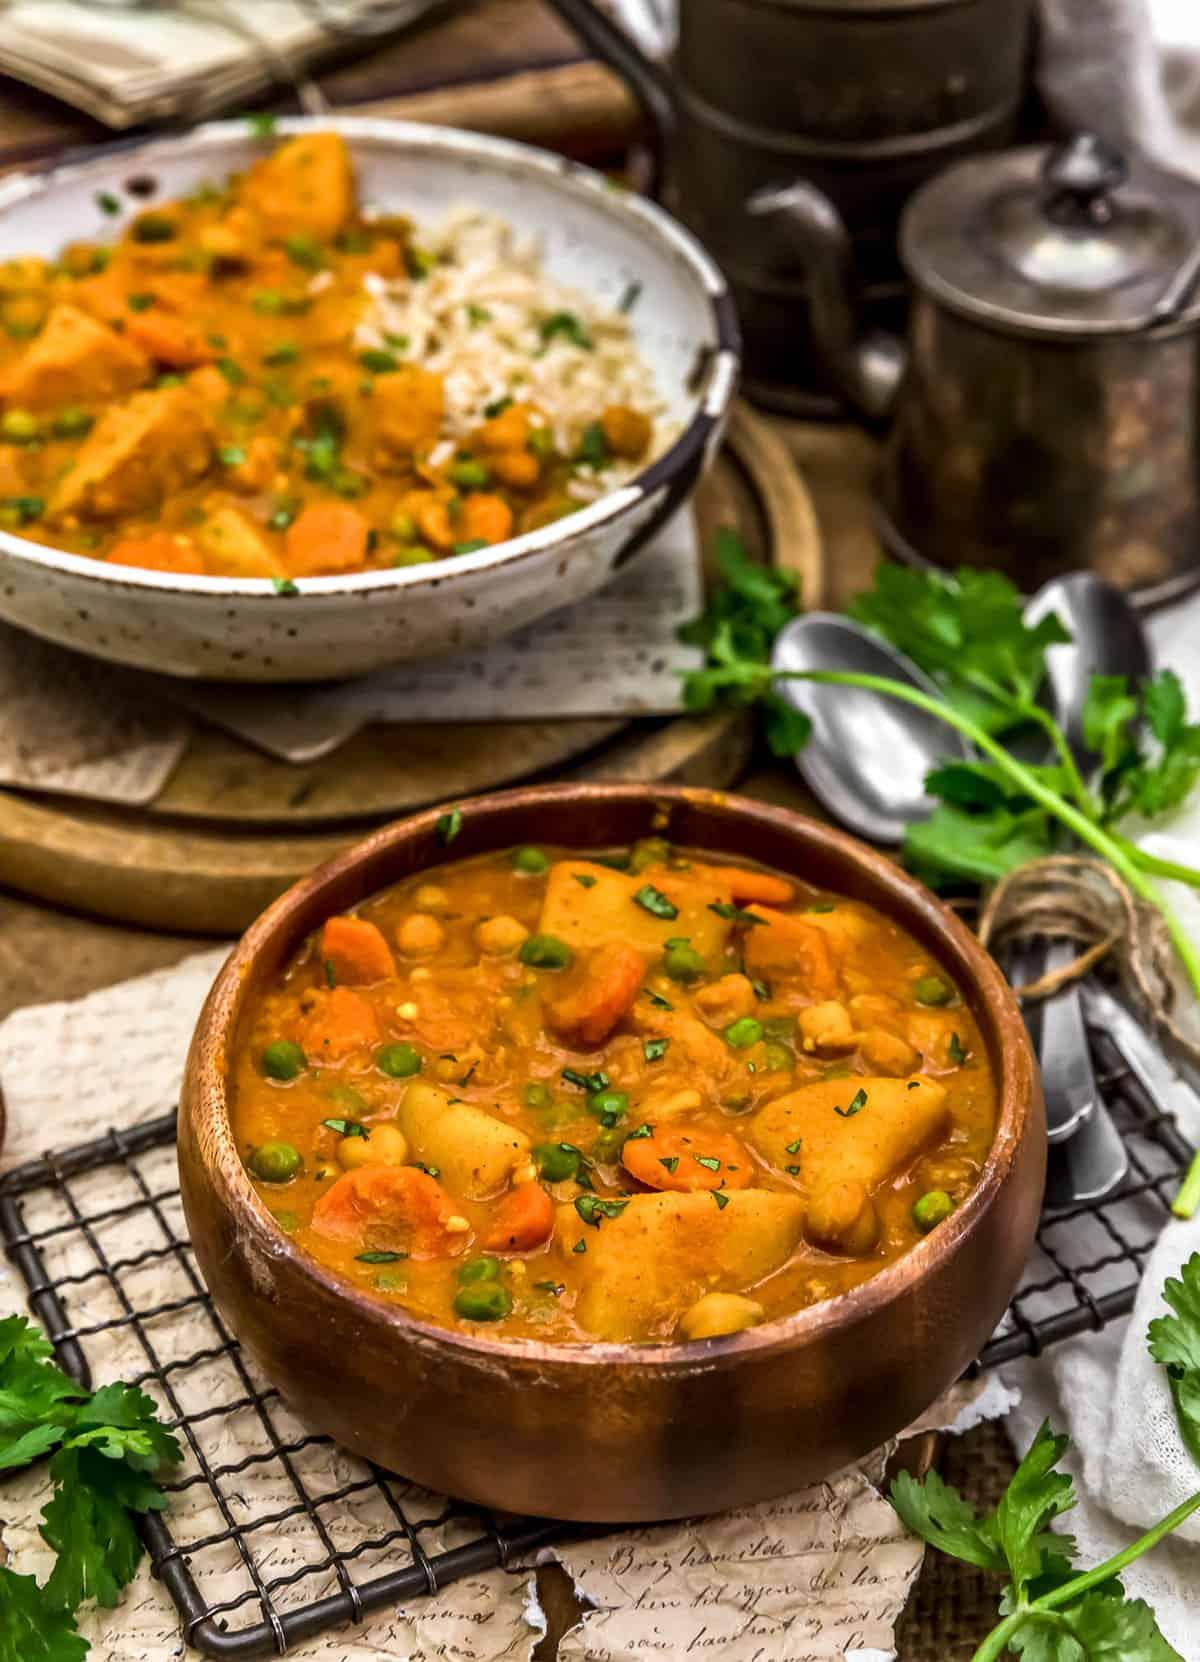 Served Thai Vegetable Massaman Curry